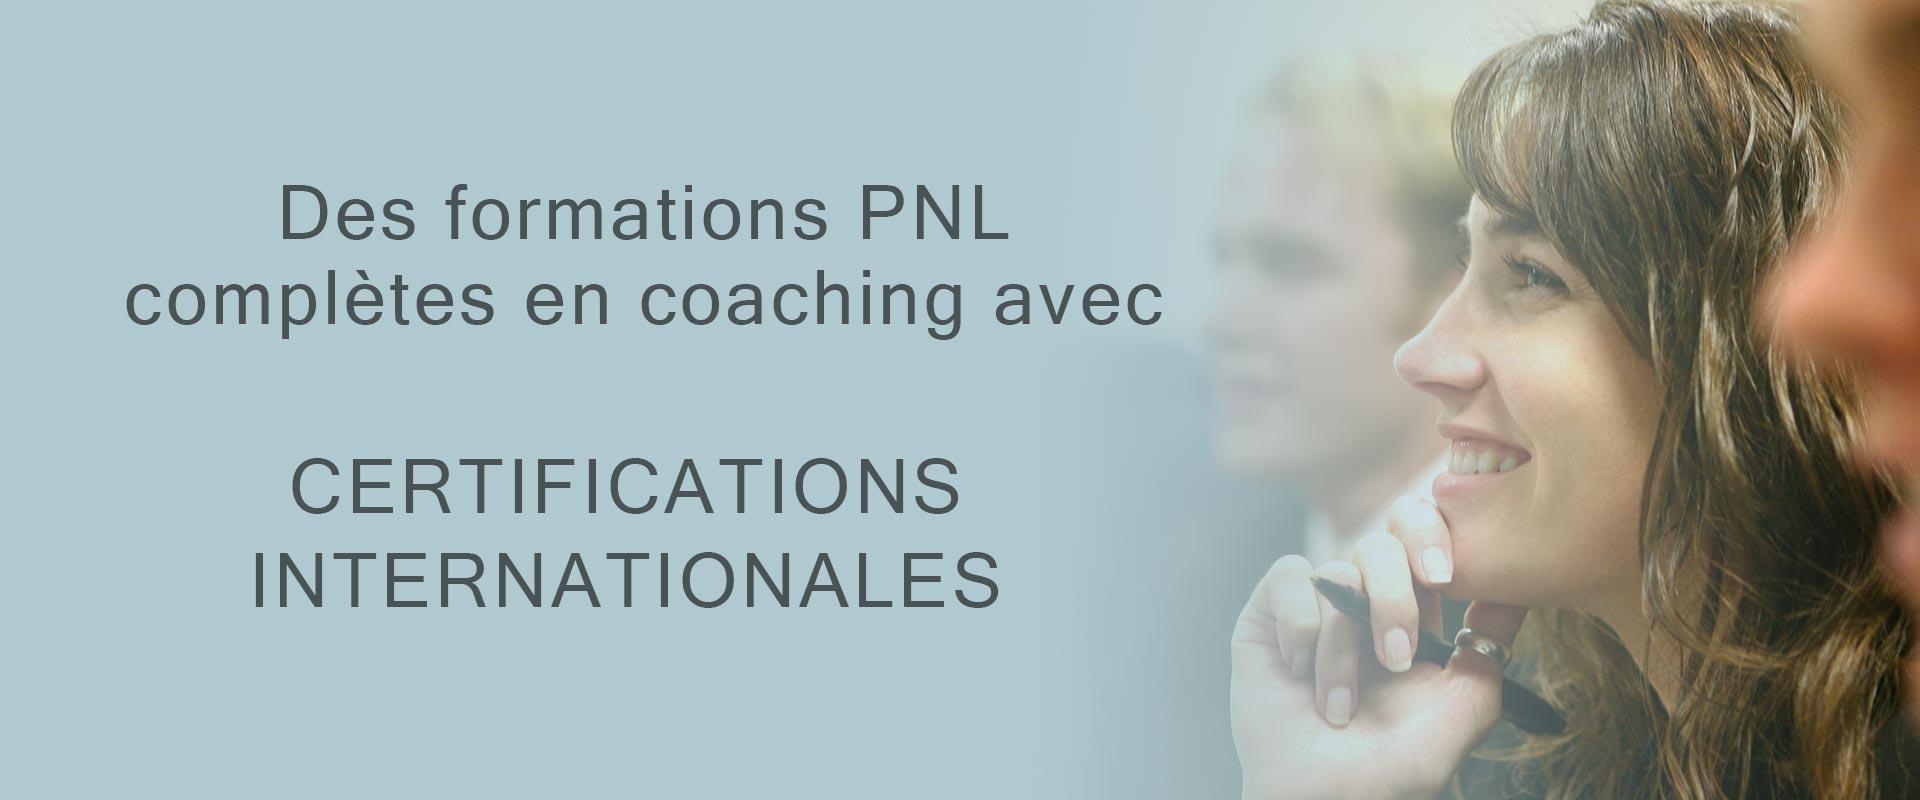 formation-pnl-coaching-certification-internationale